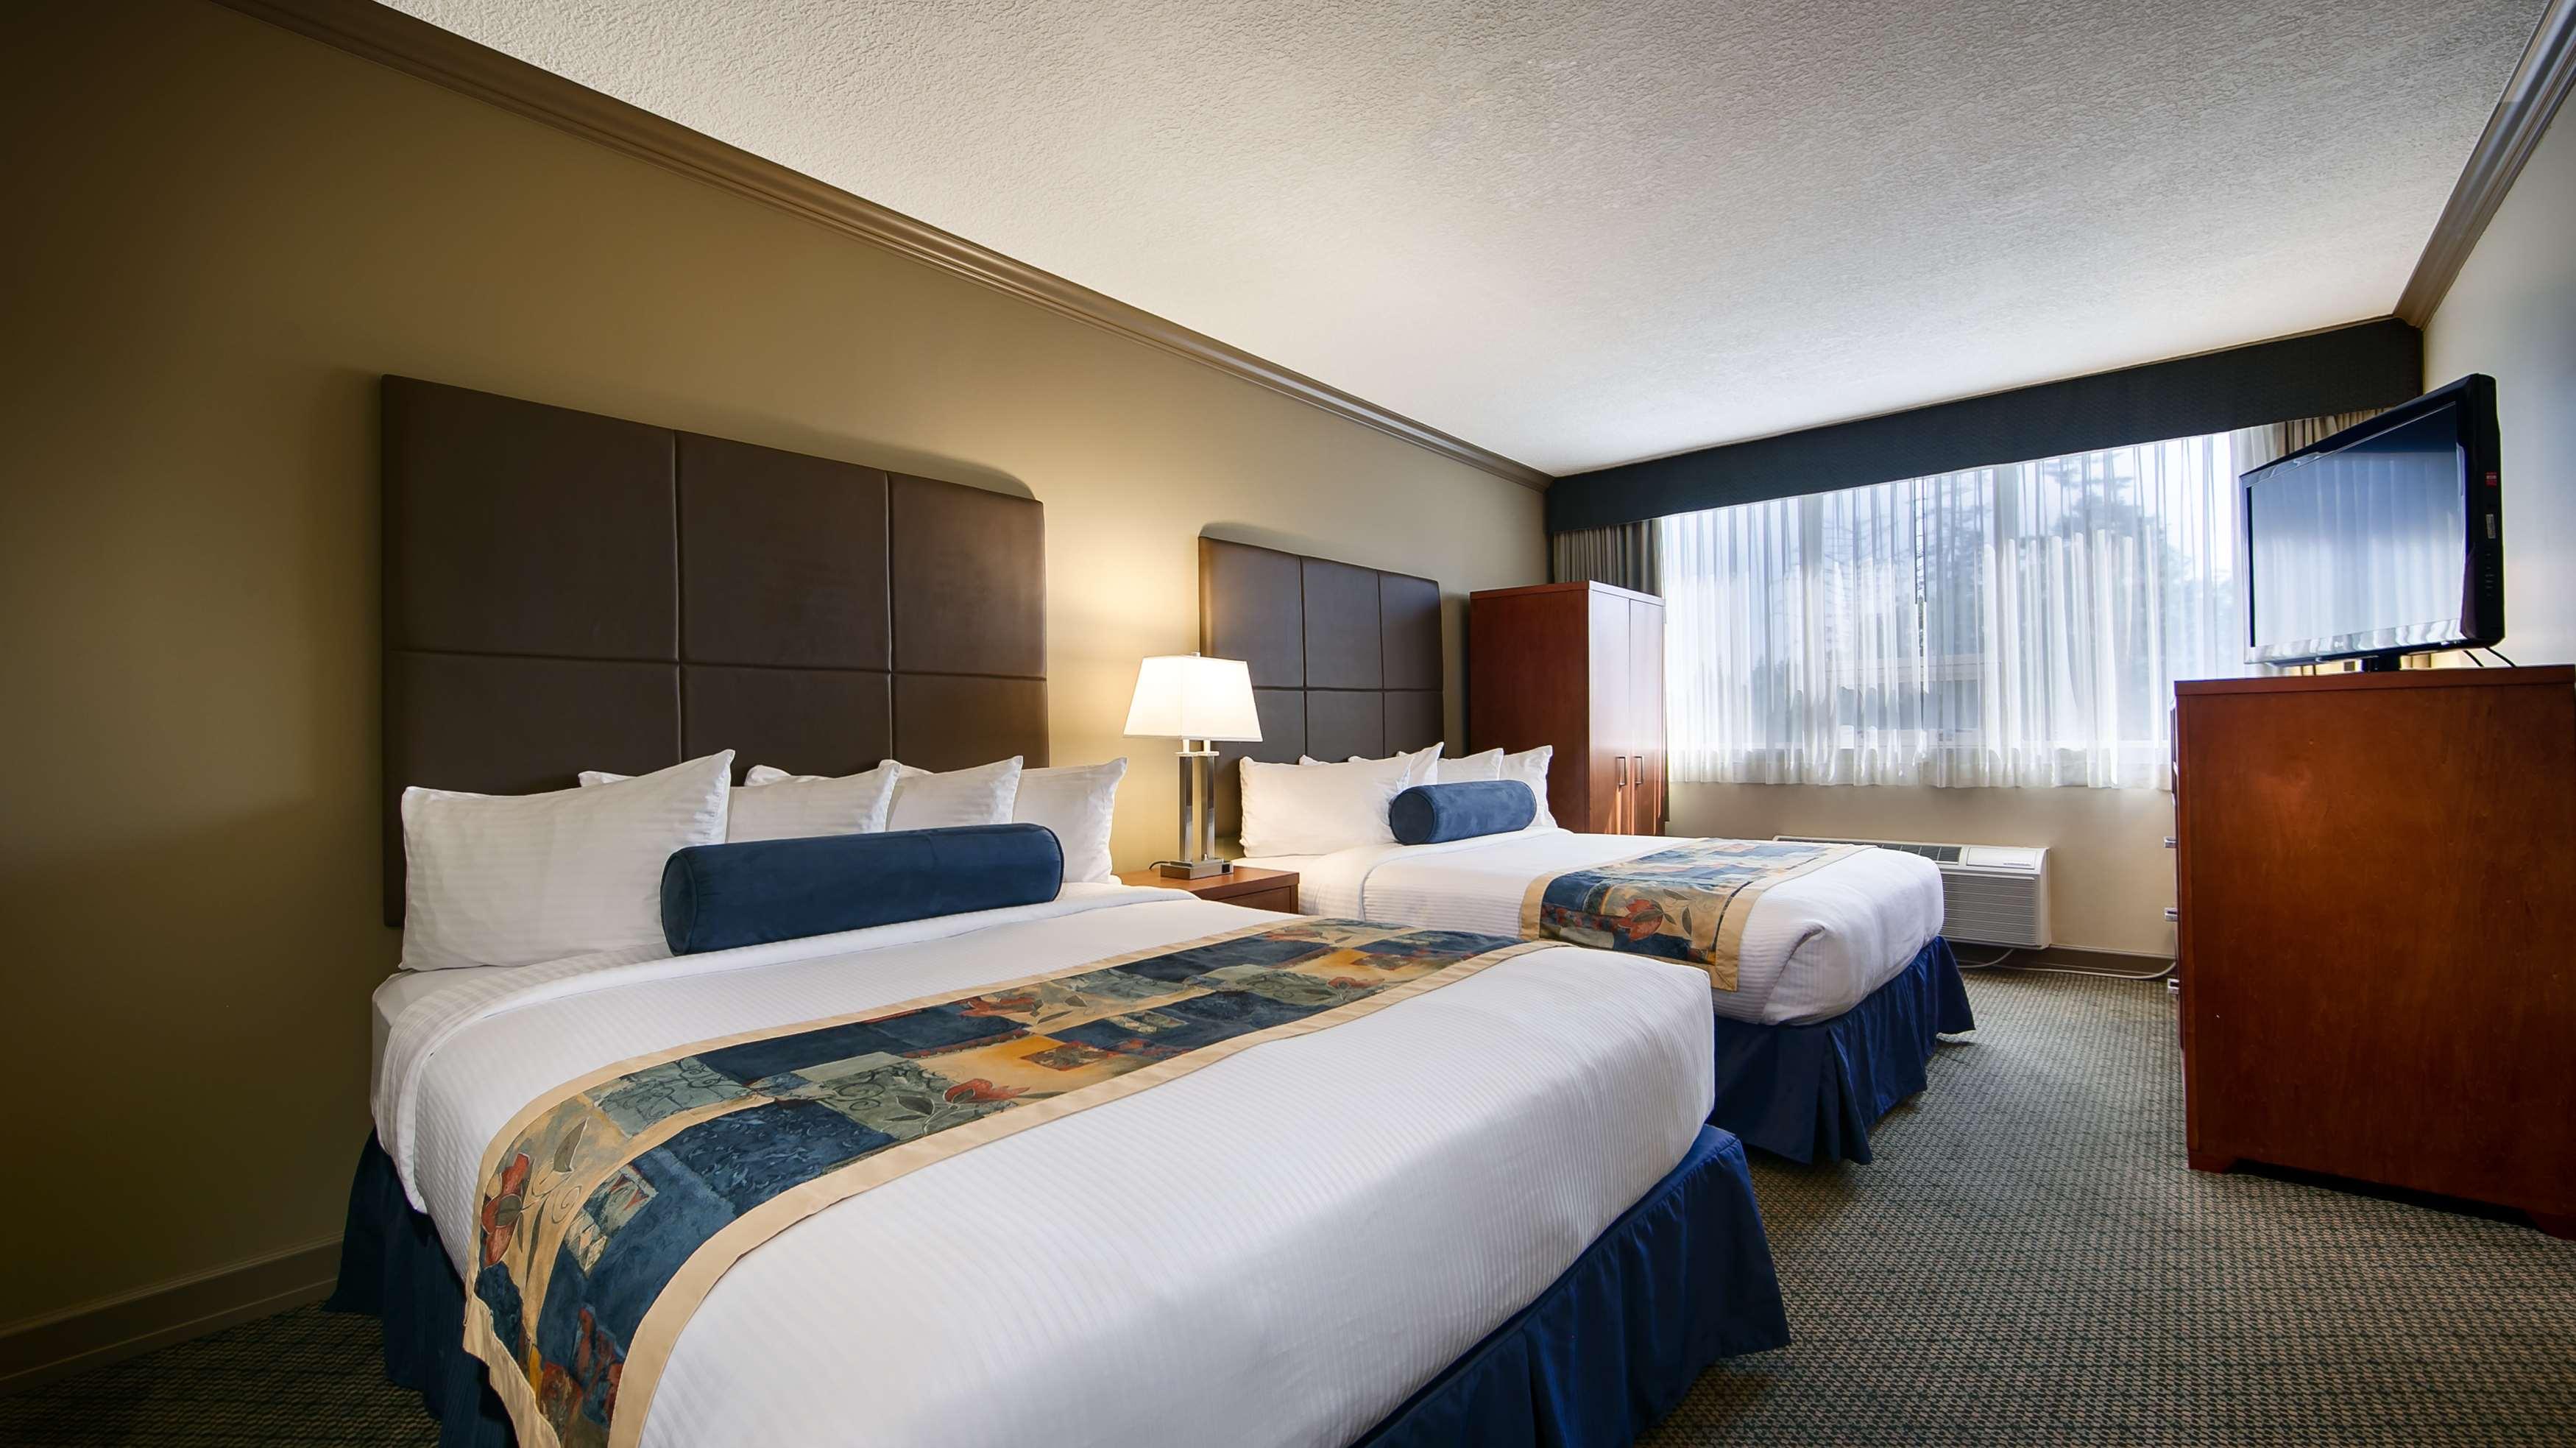 Best Western Plus Barclay Hotel in Port Alberni: Double Queen Guest Room